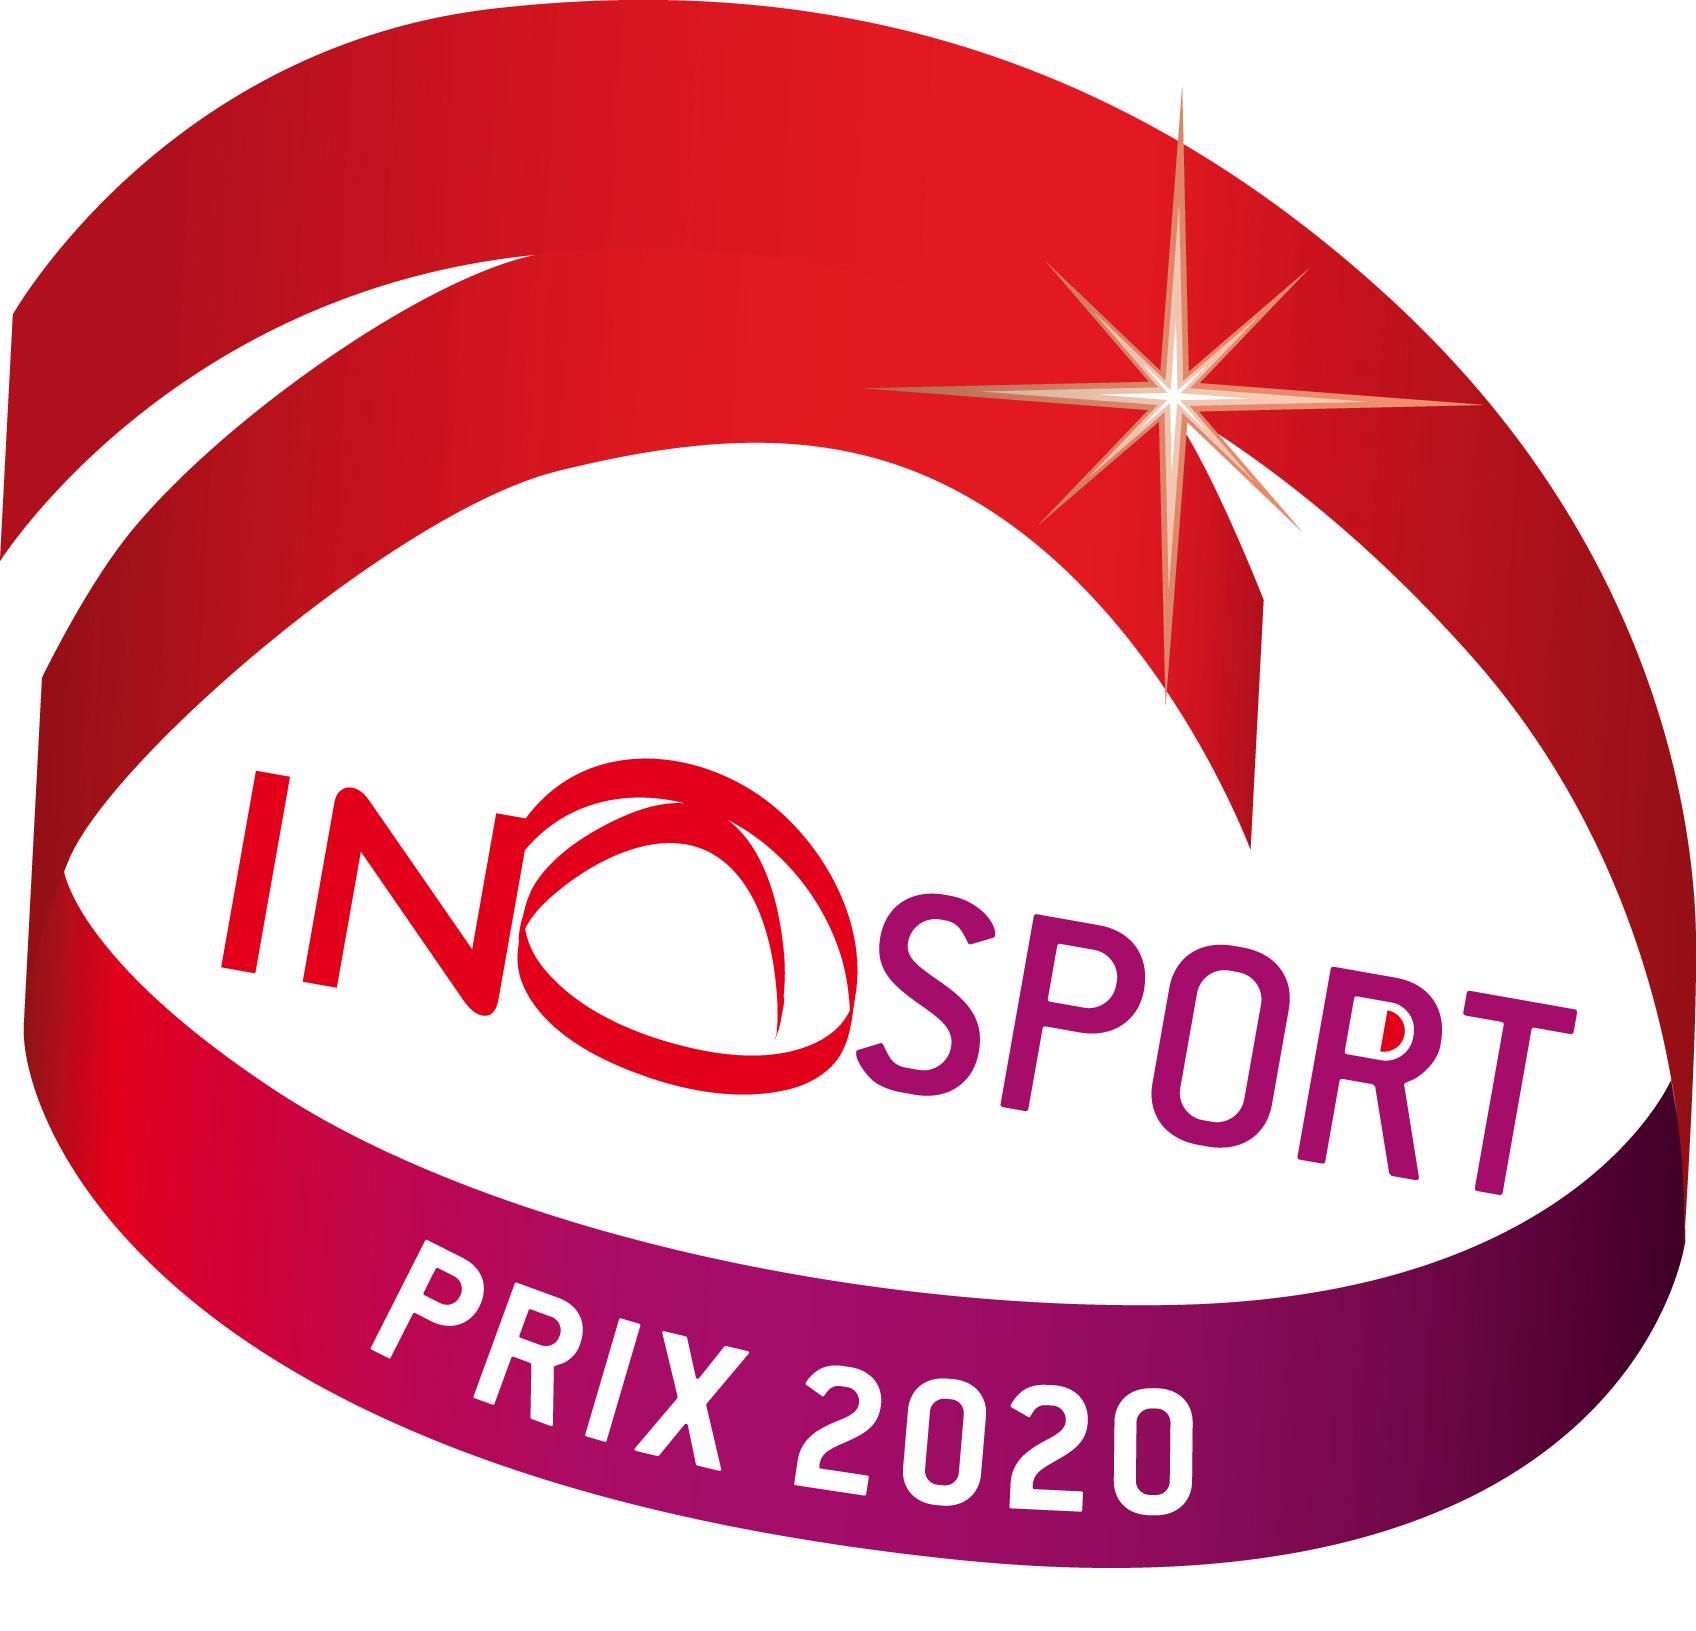 PRIX Inosport 2020.jpg